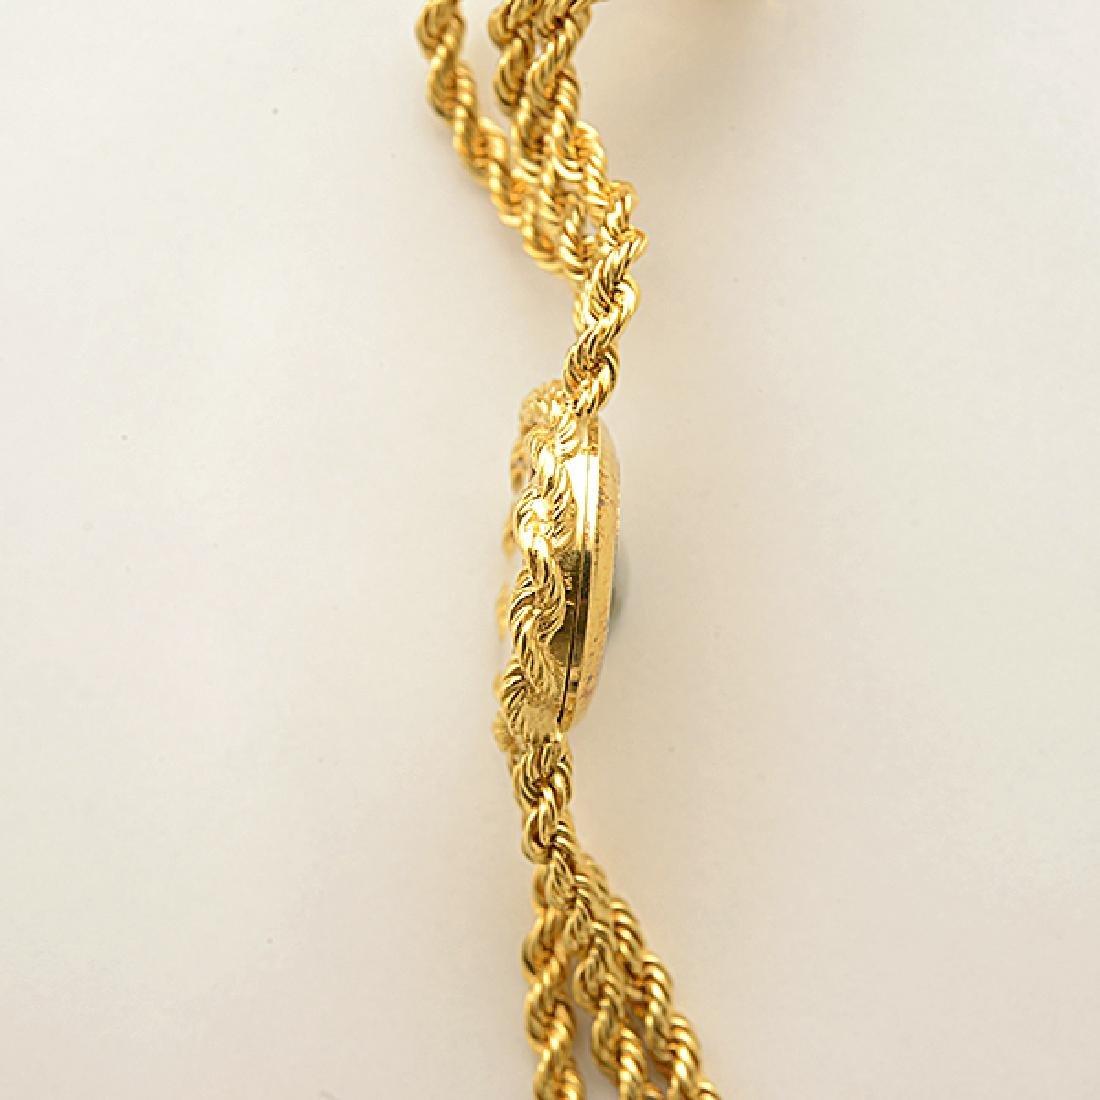 Ladies Chopard 18k Yellow Gold Wristwatch. - 3